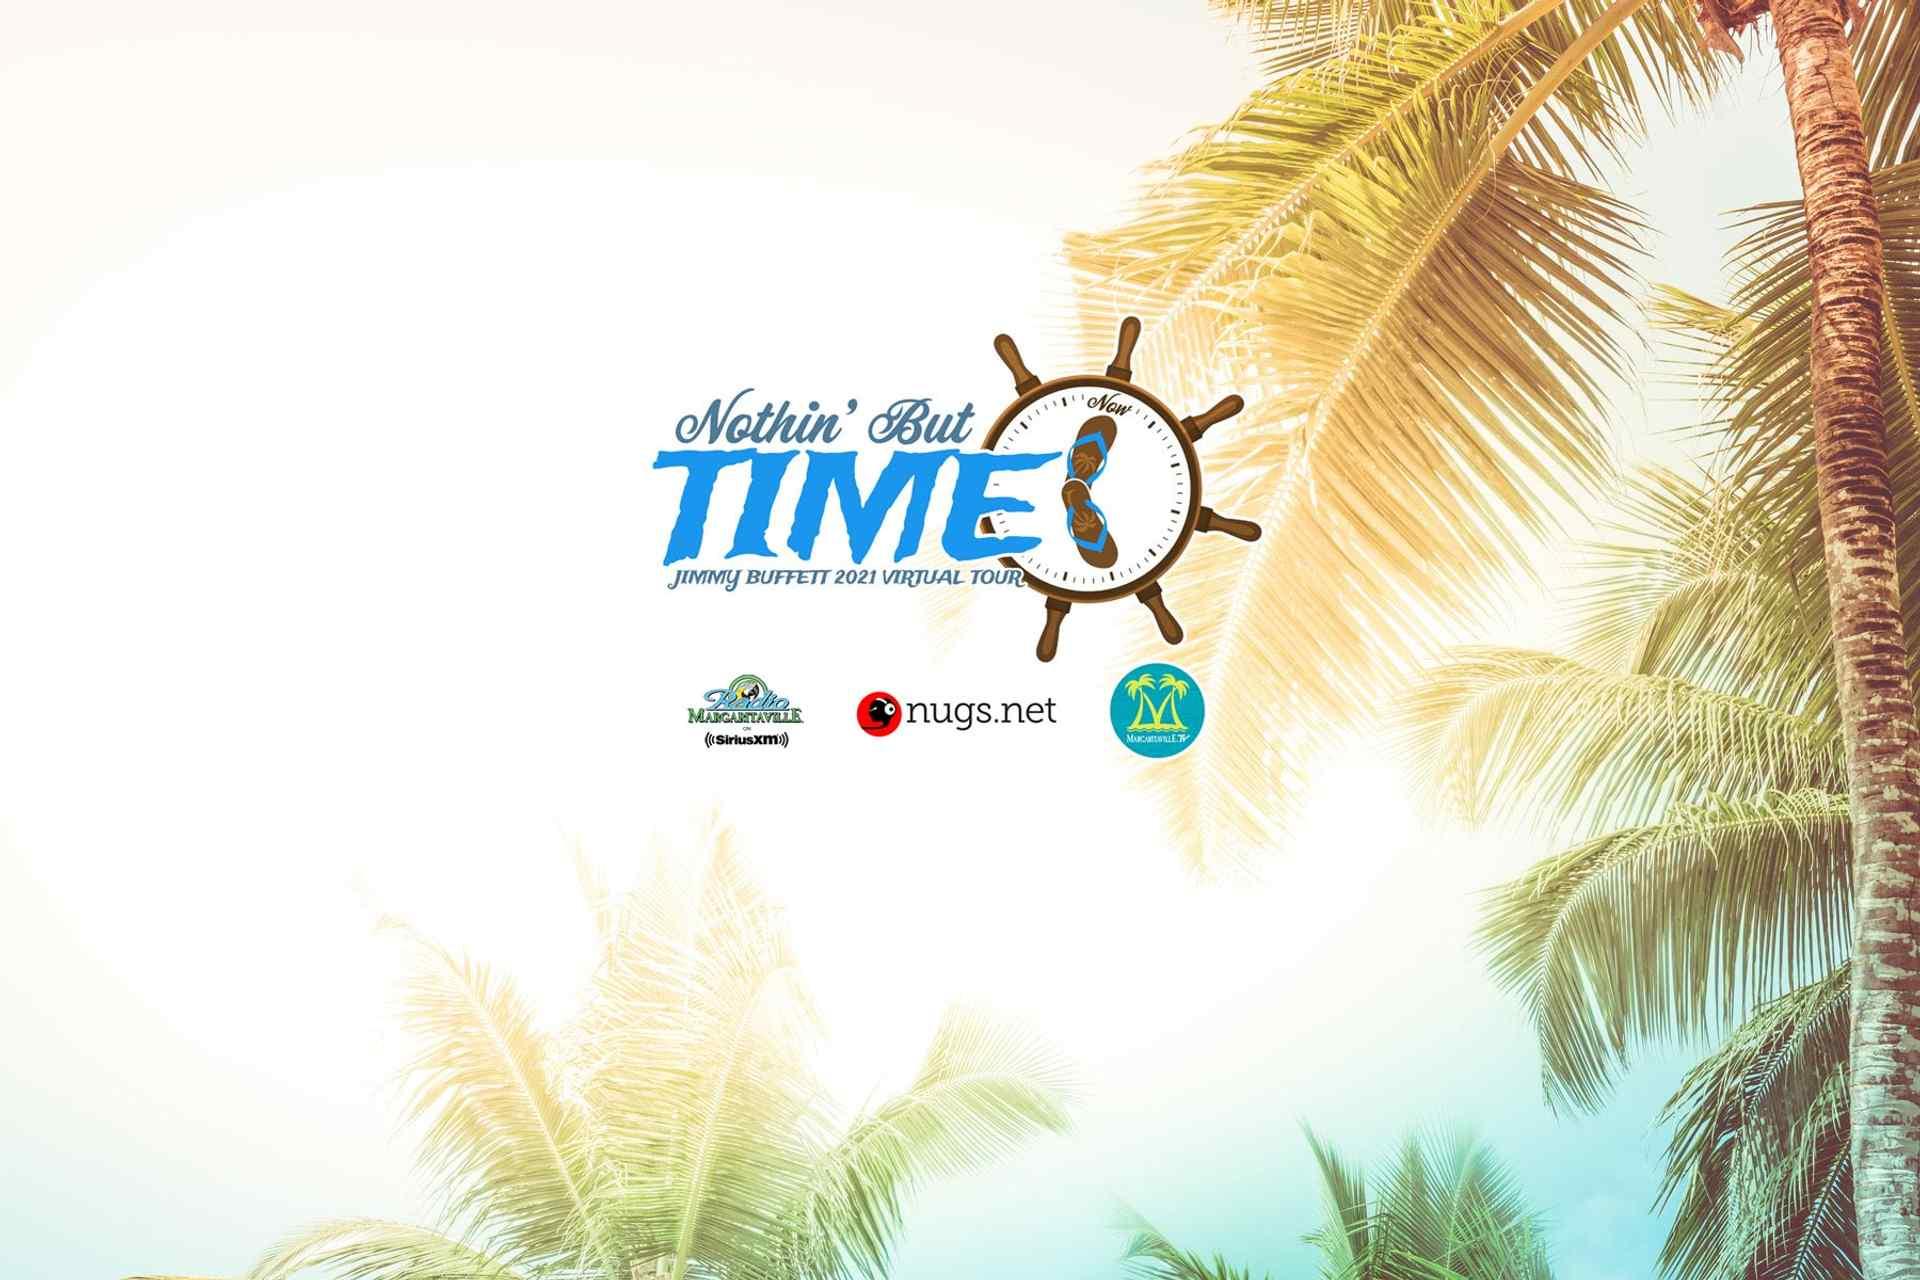 Nothin' But Time 2021 Virtual Tour